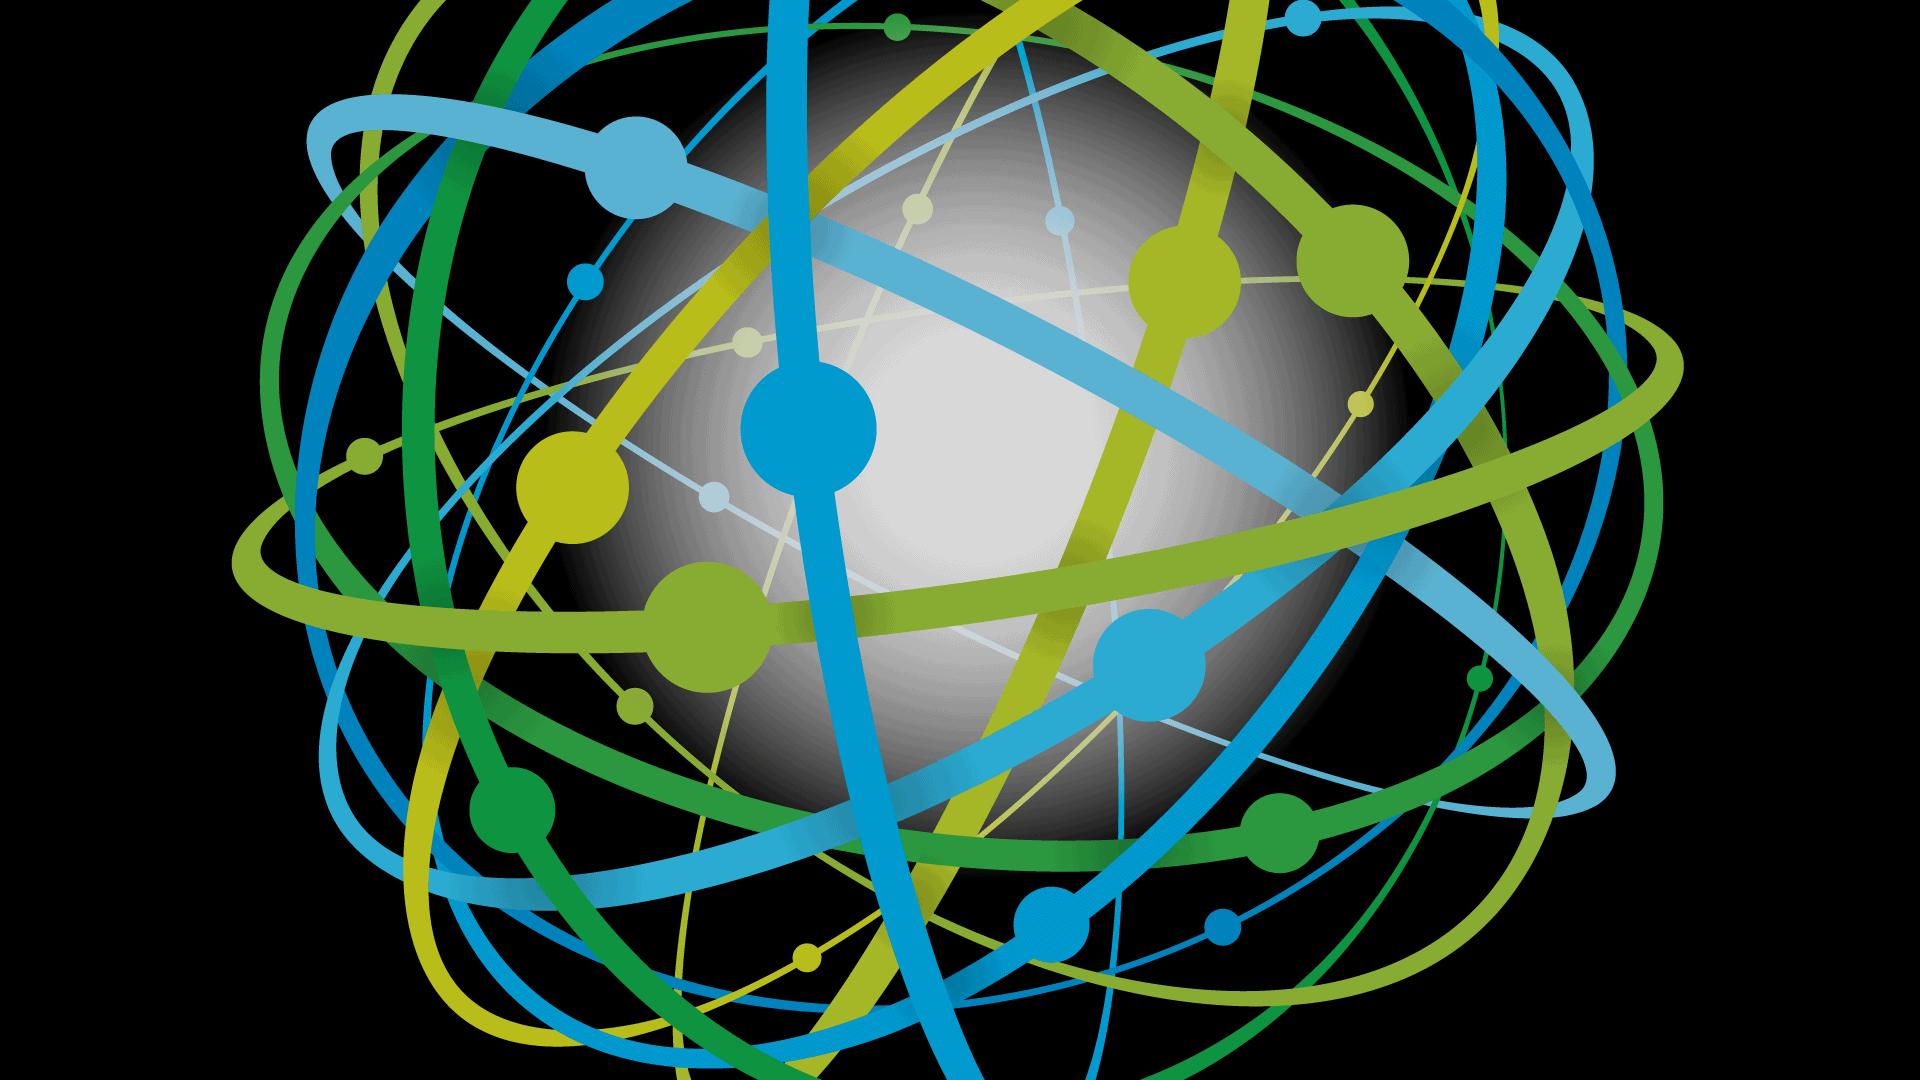 IBM's logo for Watson